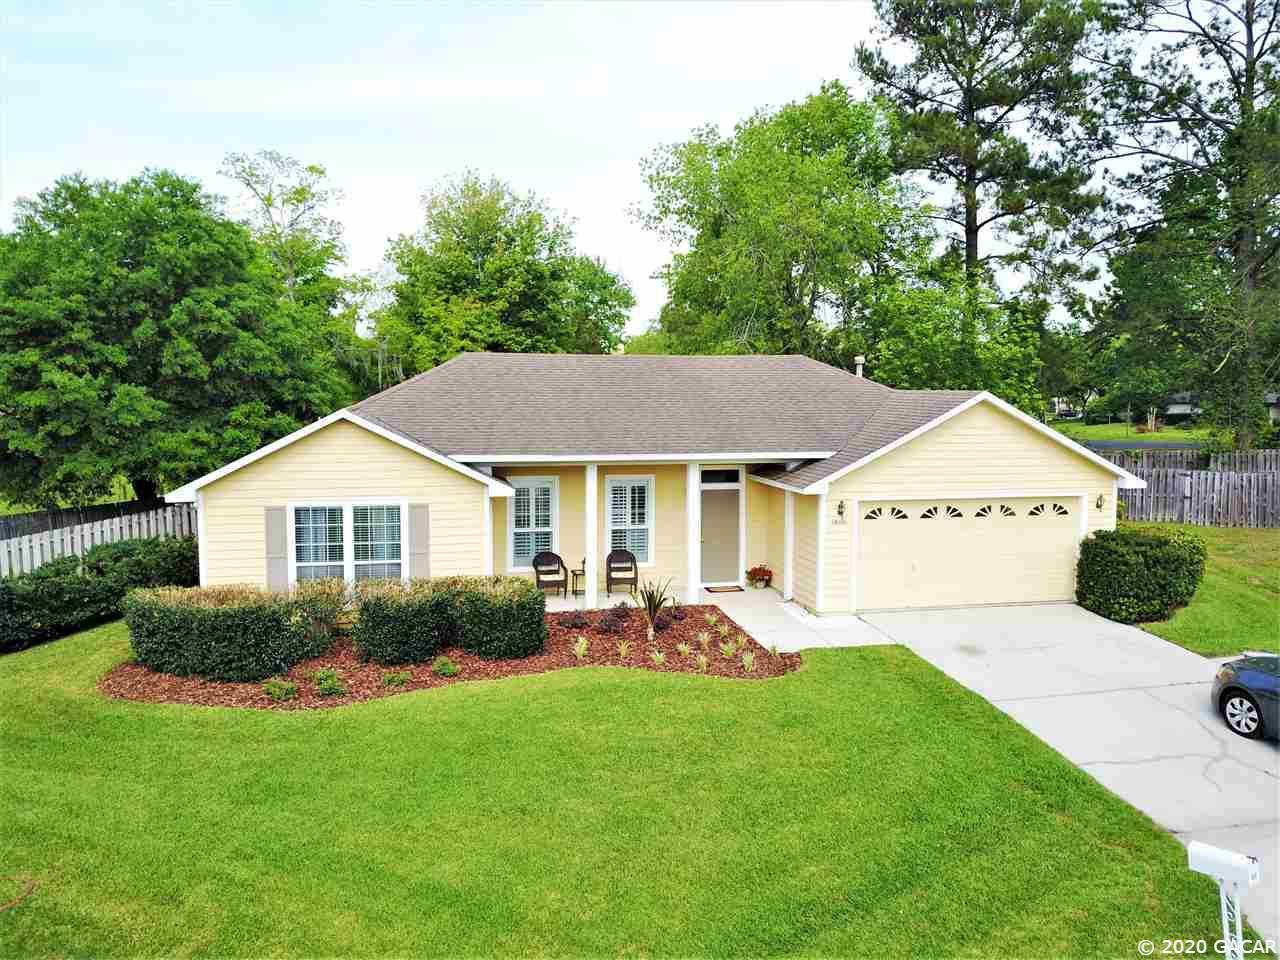 10636 NW 61st Terrace, Alachua, Florida